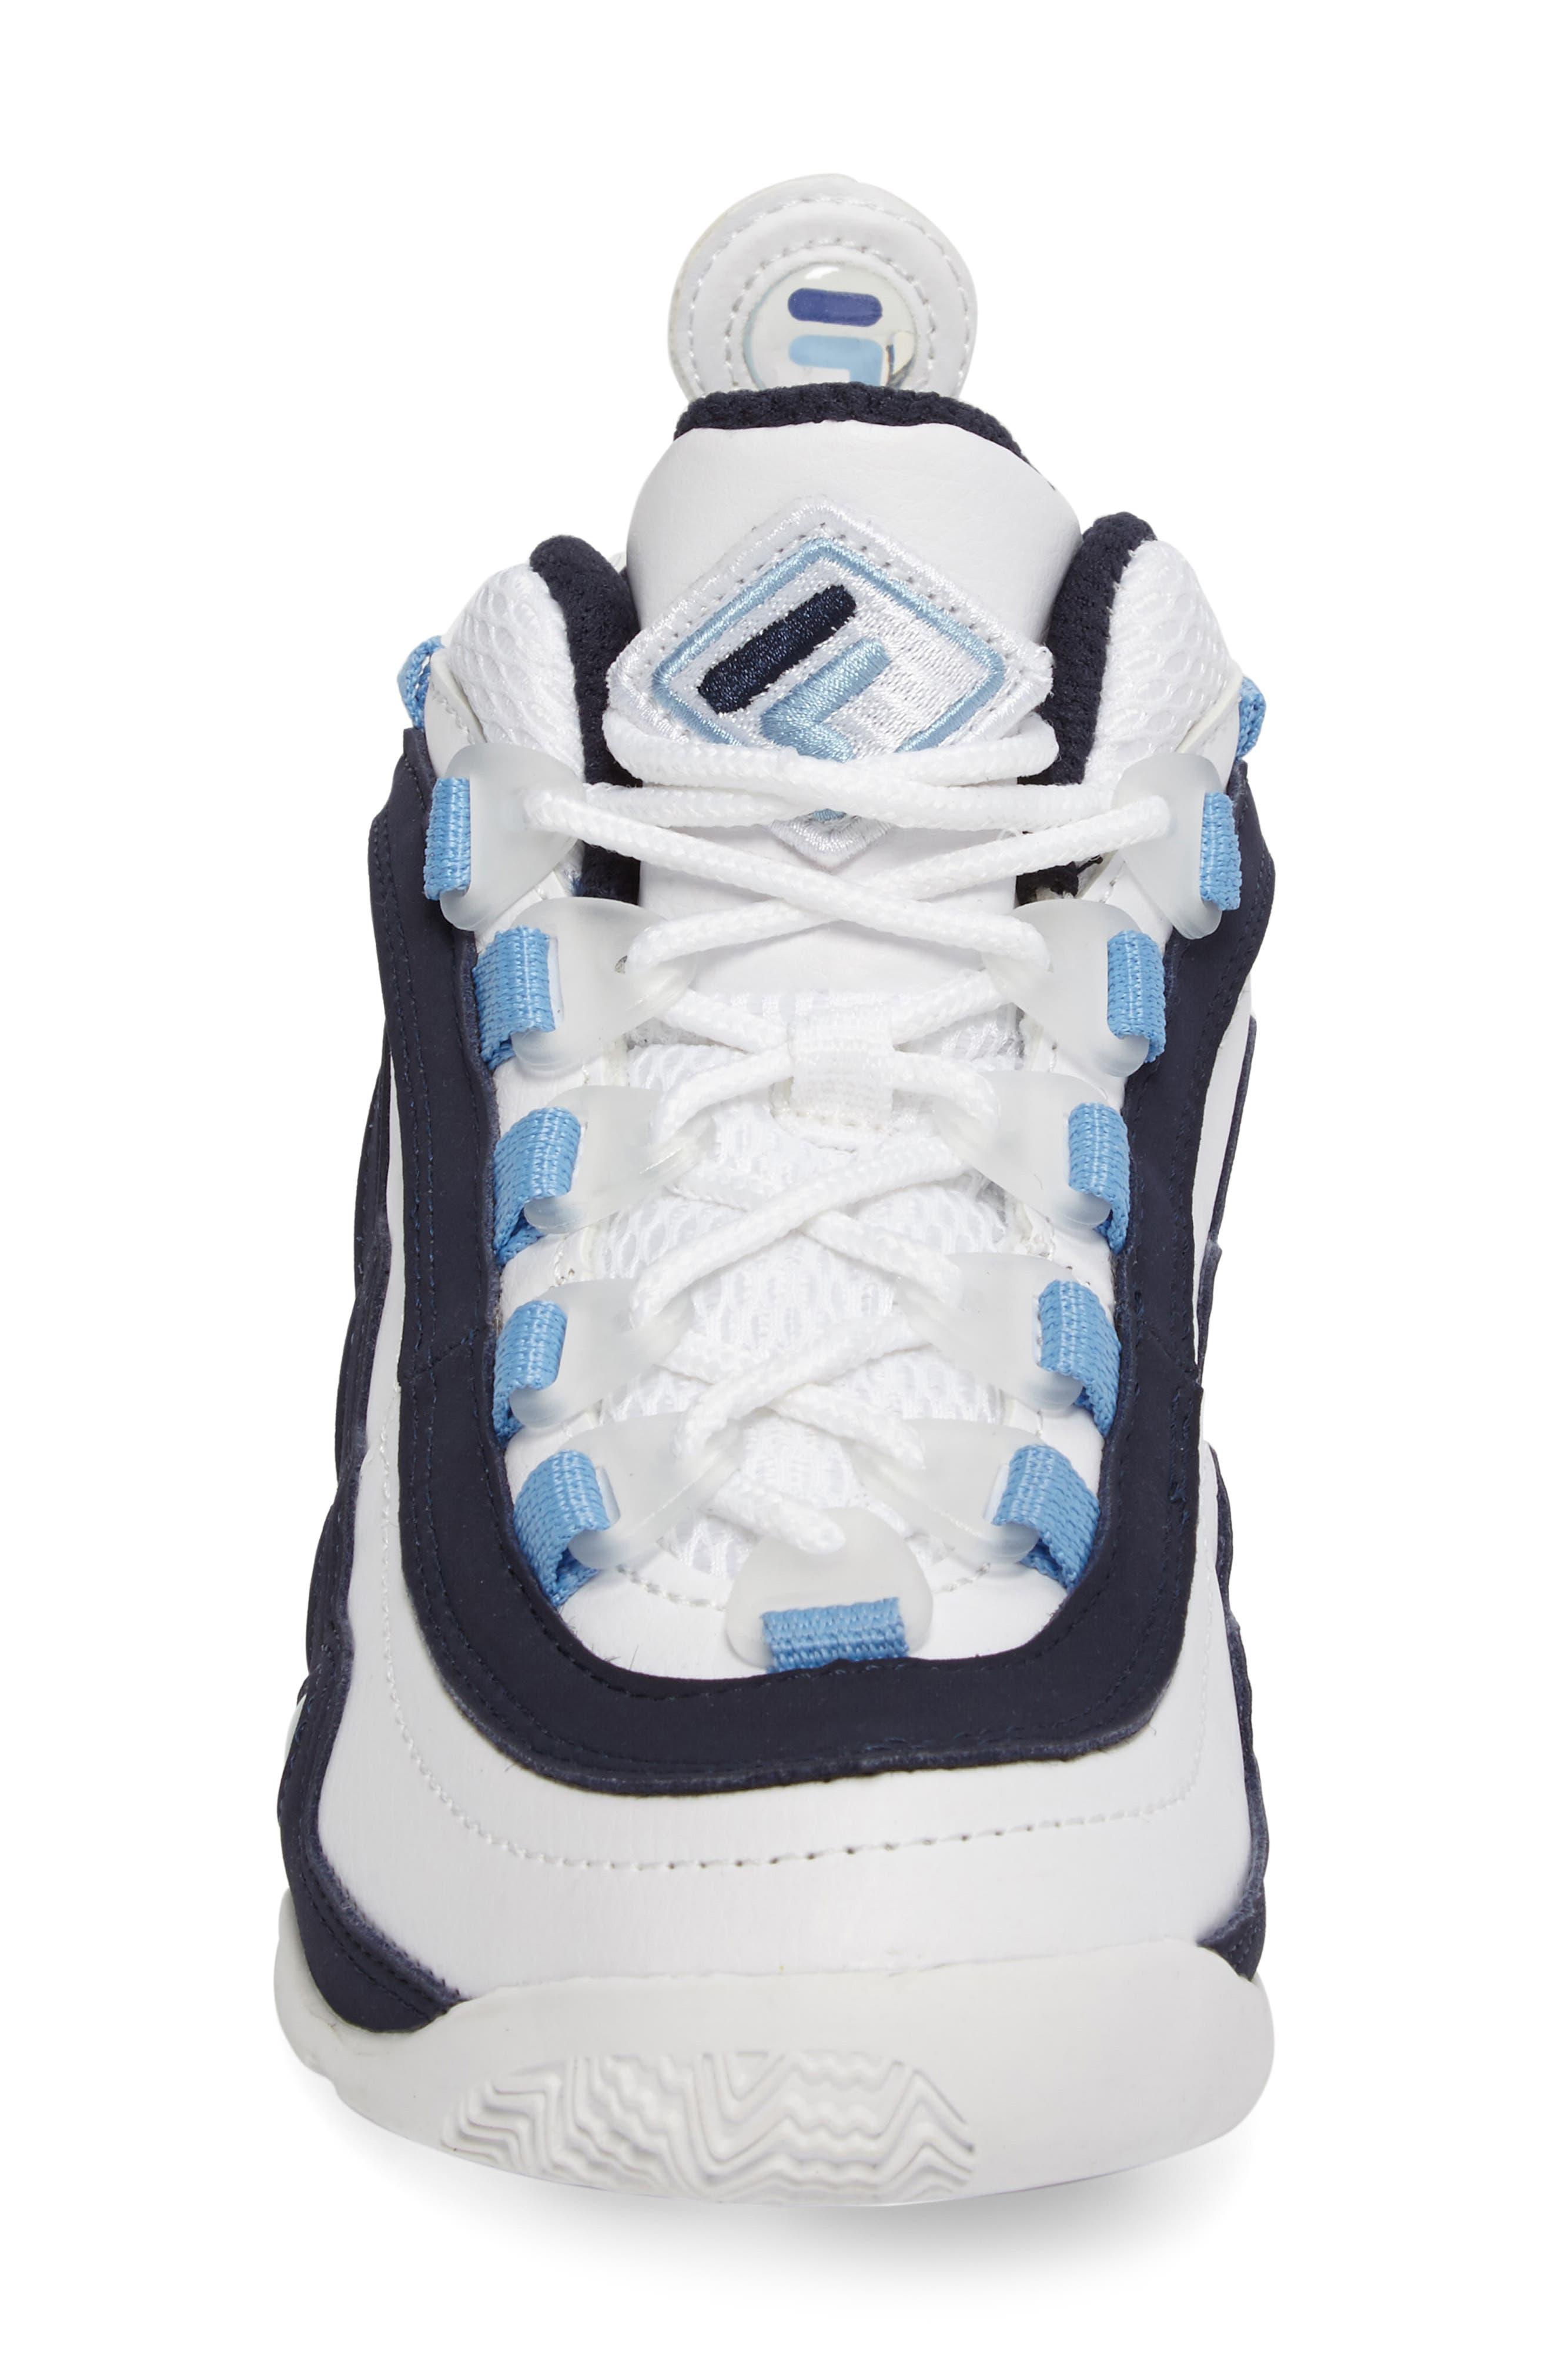 Bubbles Mid Top Sneaker,                             Alternate thumbnail 4, color,                             147